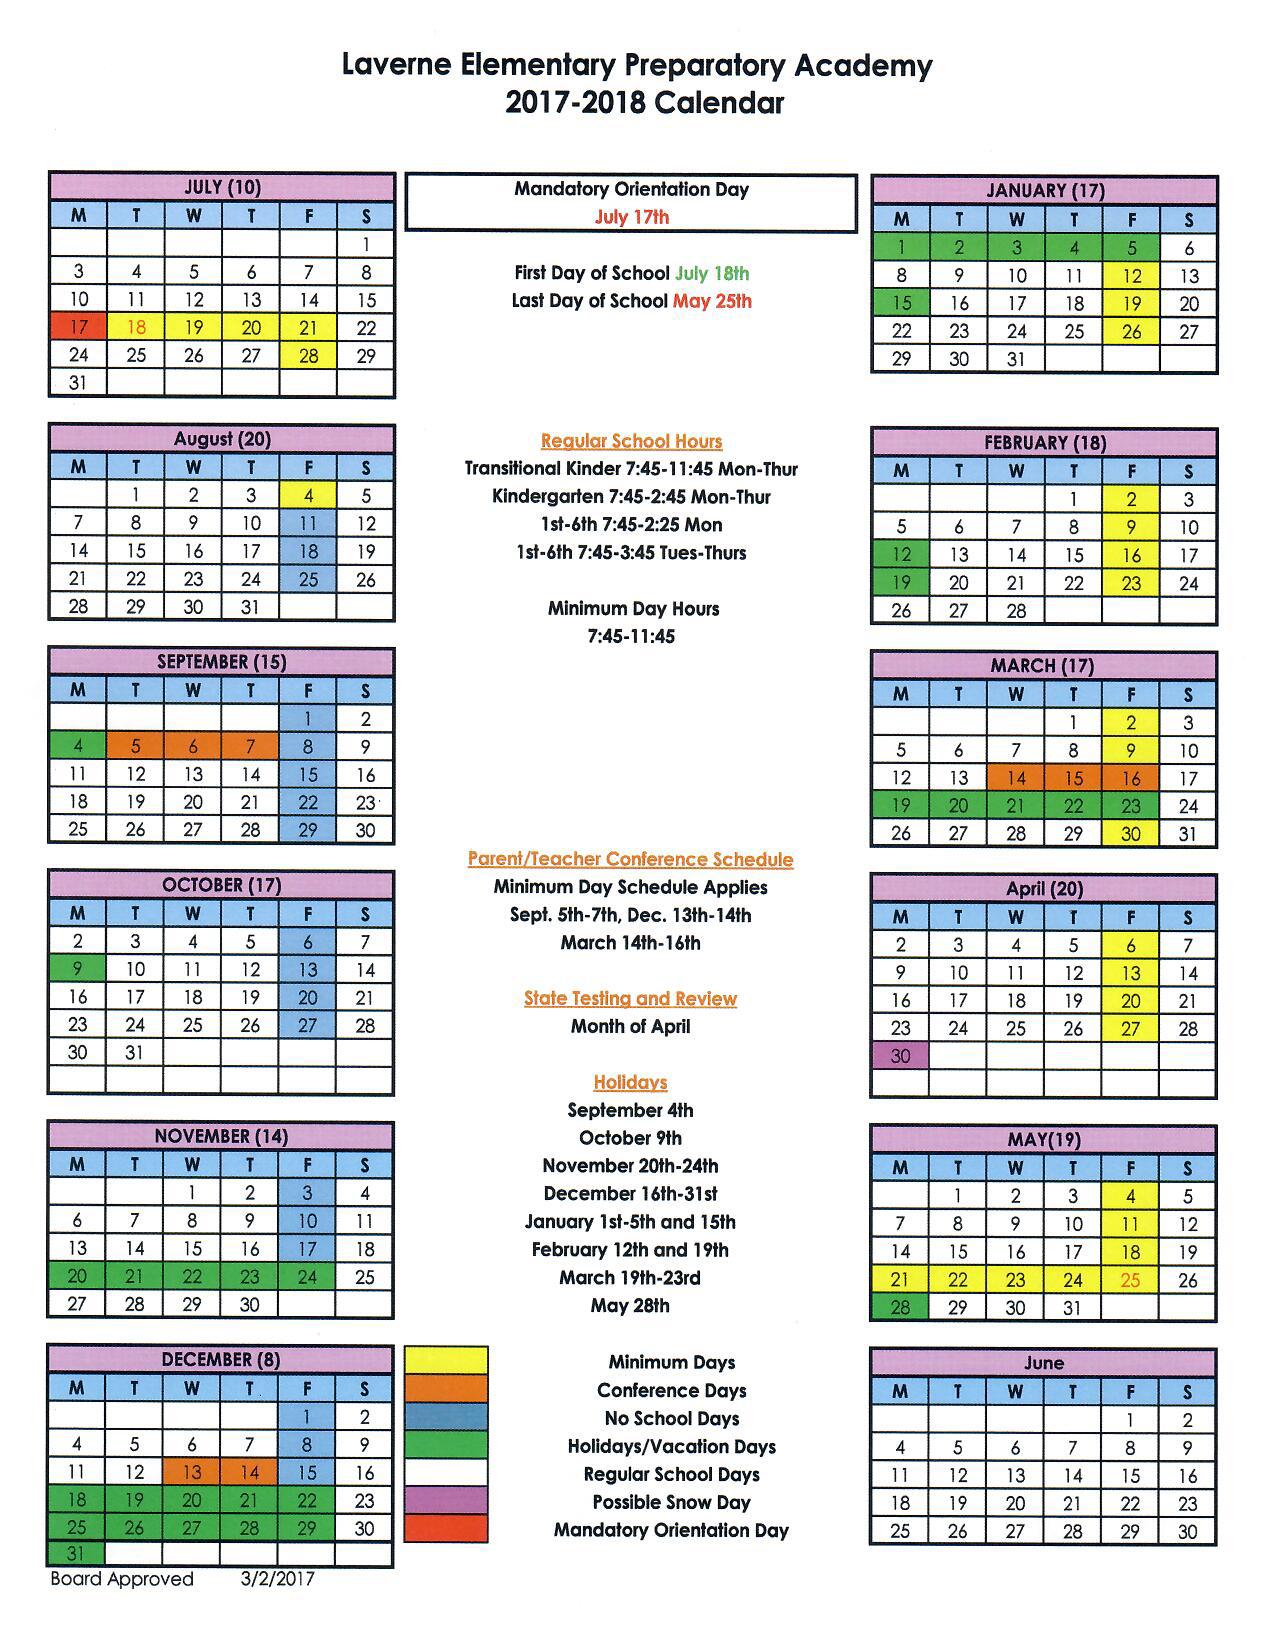 School Calendar 2018 : School calendar lepacademy